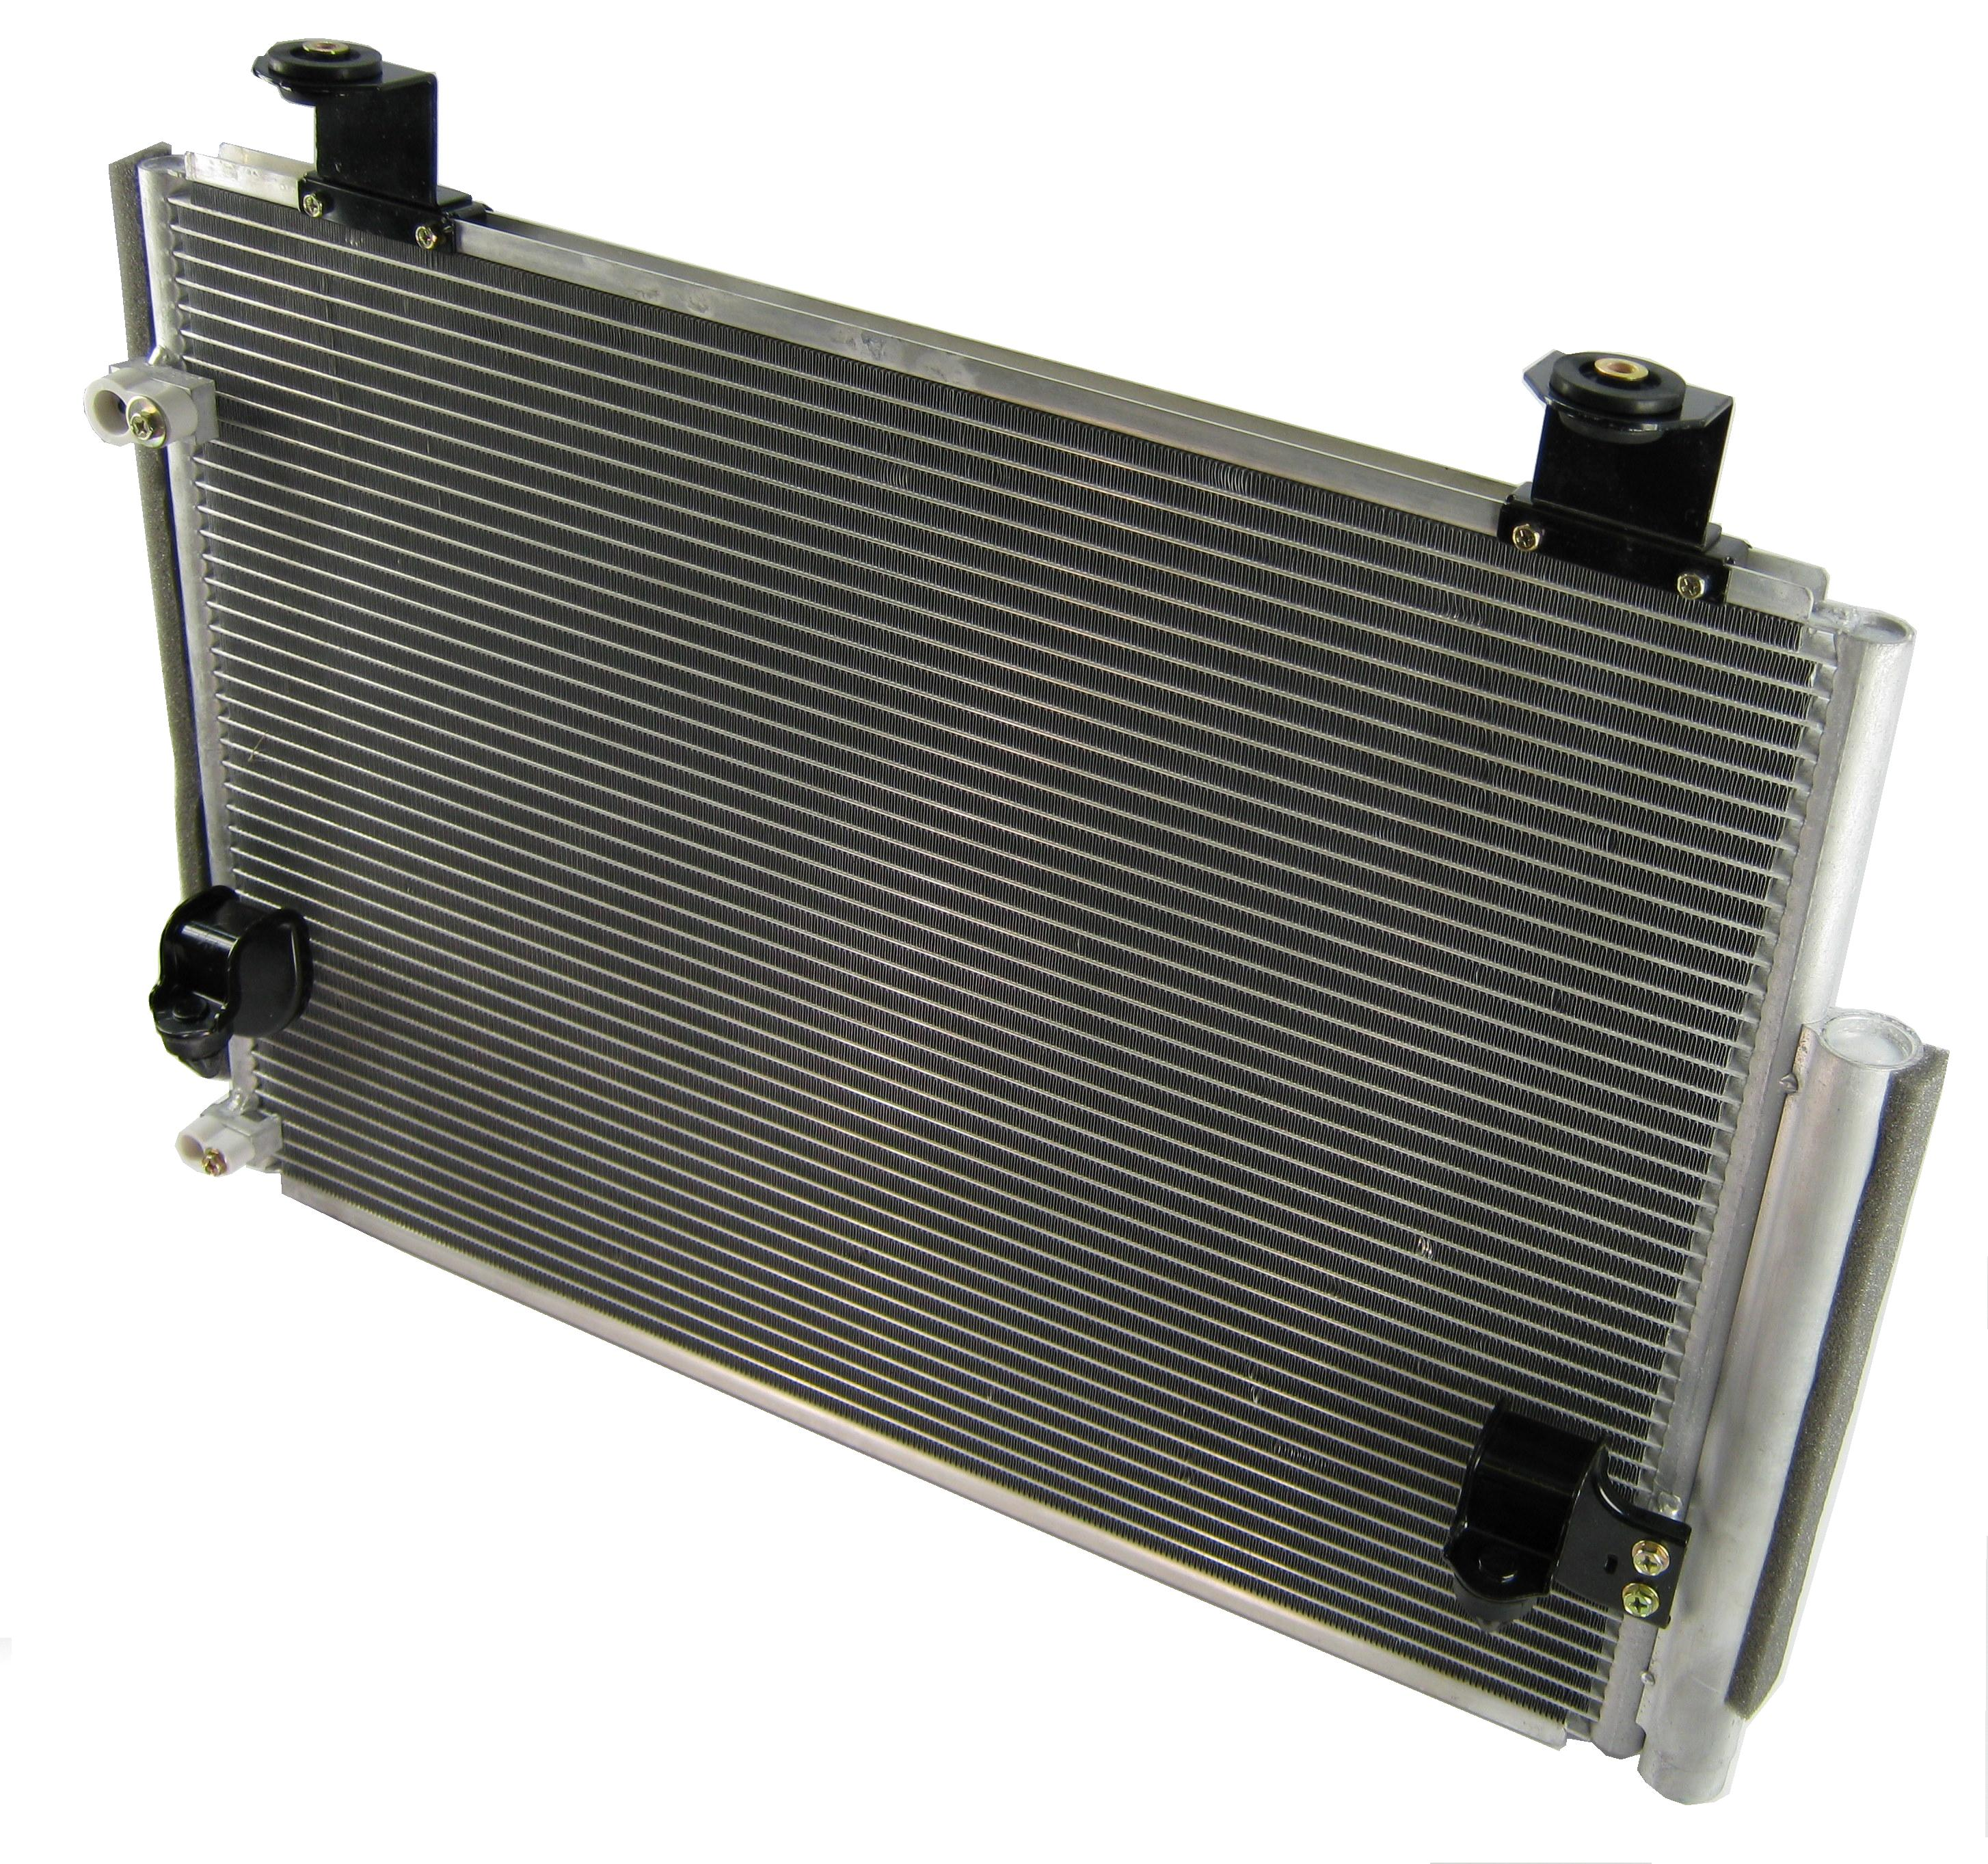 Air Conditioning Condenser Radiator For Toyota Hilux Vigo